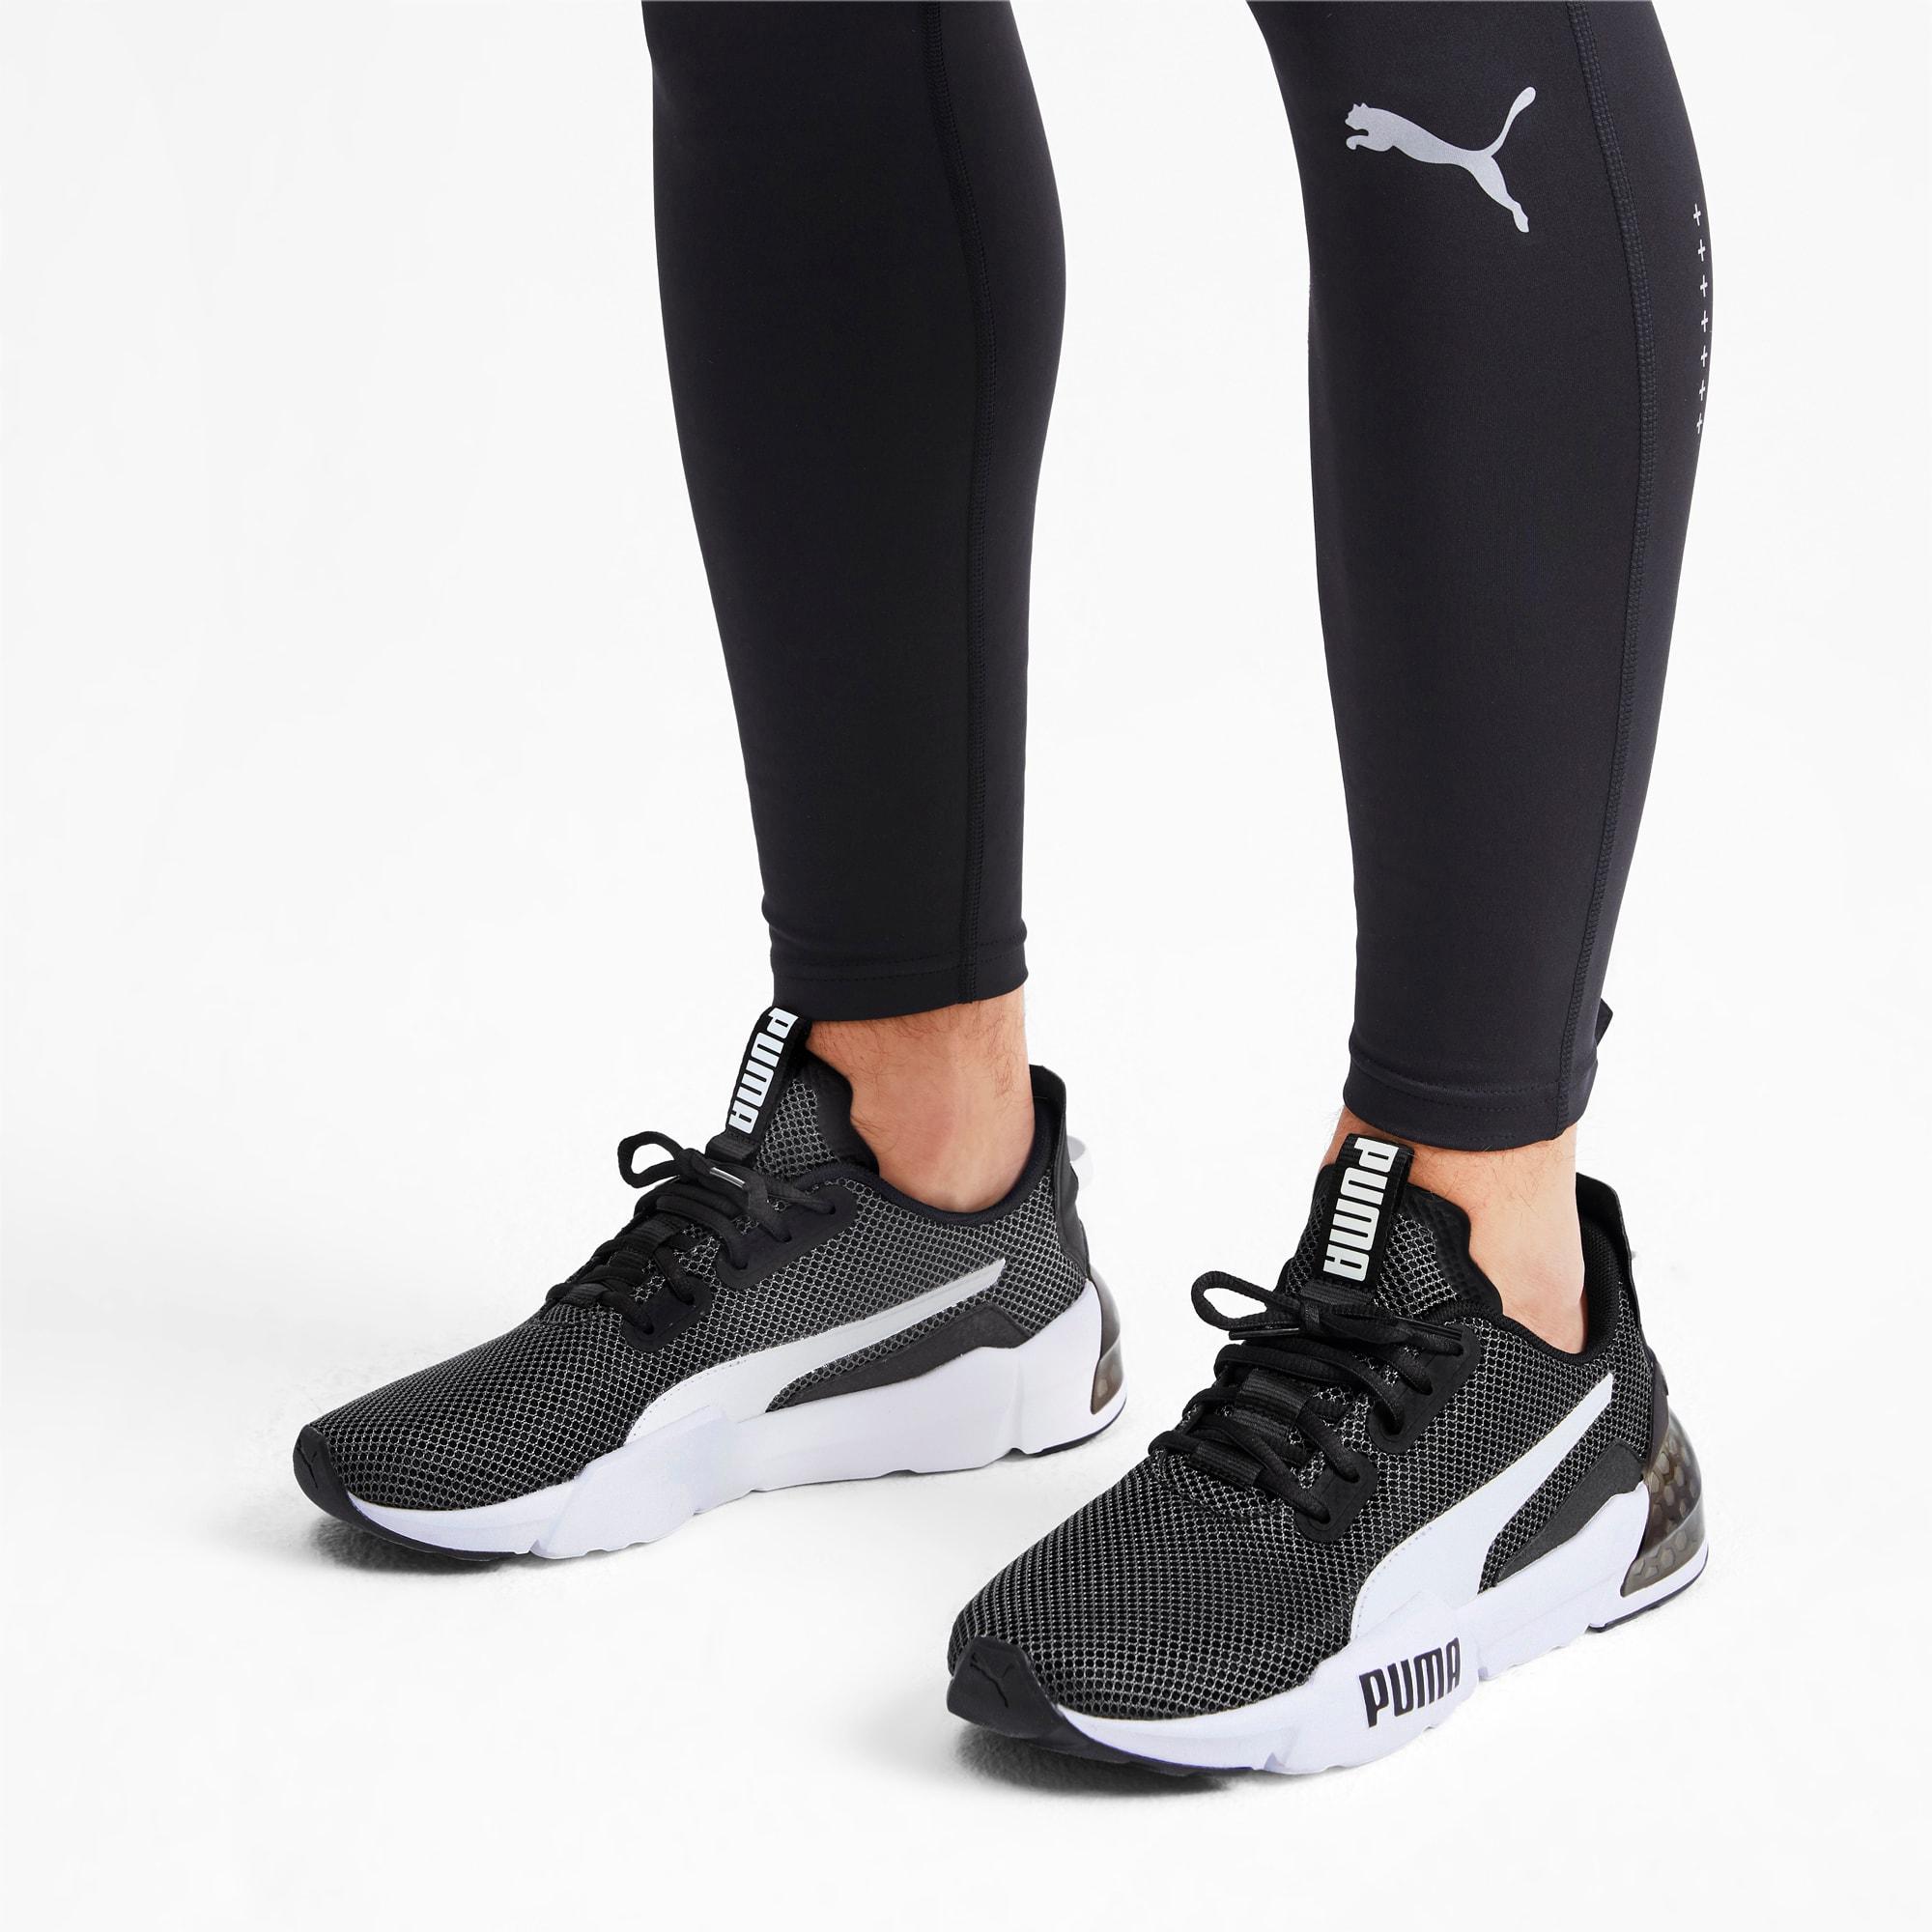 CELL Phase Herren Running Sneaker | PUMA Shoes | PUMA